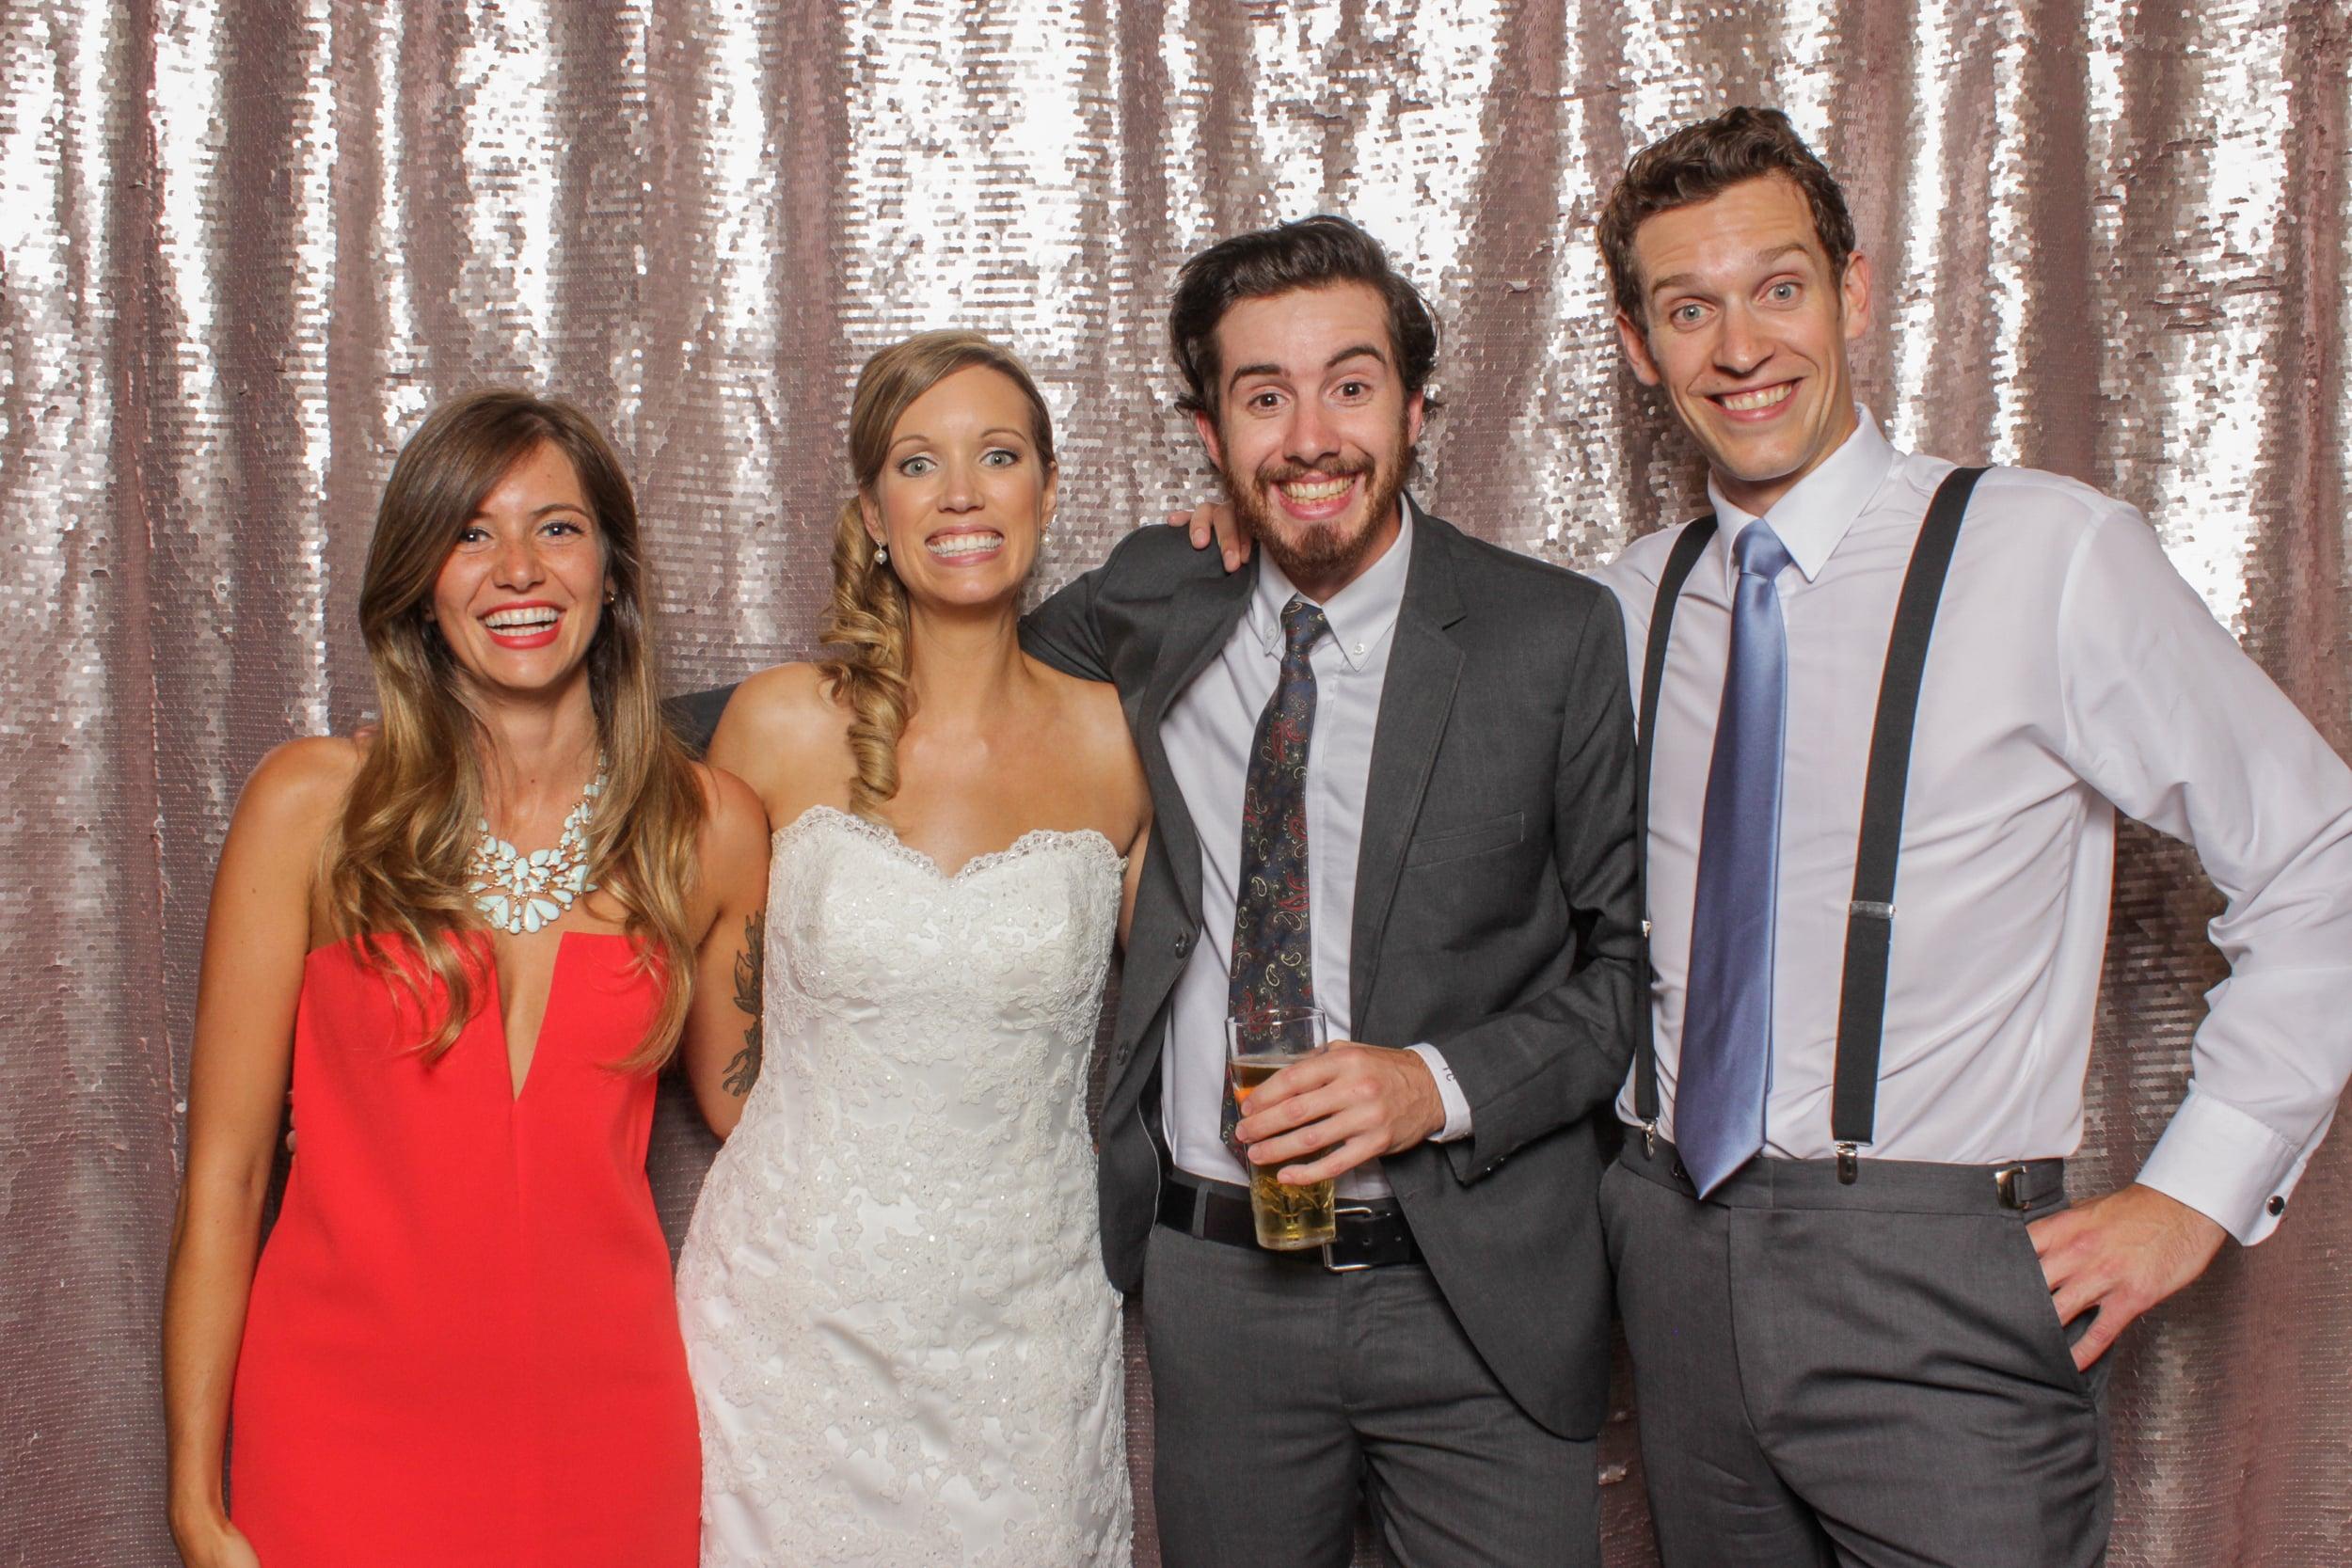 ottawa-wedding-photobooth-65.JPG